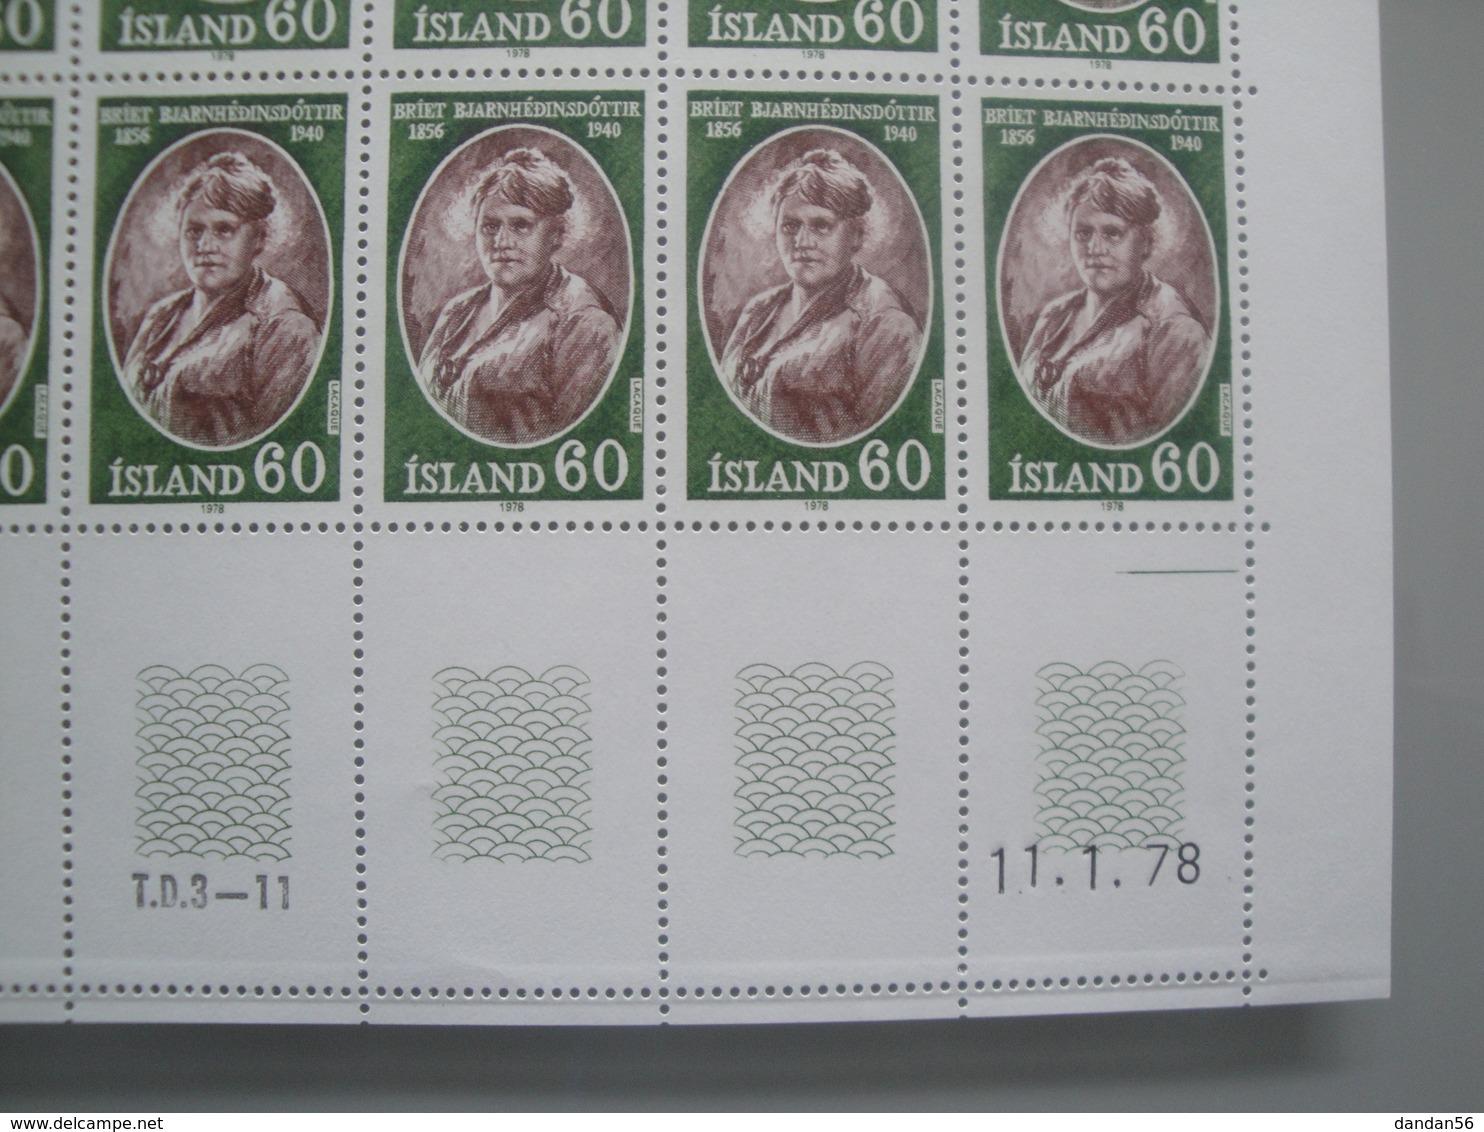 1978 Islande  Yv  481/2 X 15 **  Personnalités Islandaises Scott 504/5  Michel 528/9 SG Xx Facit 565/6 - Collections, Lots & Séries